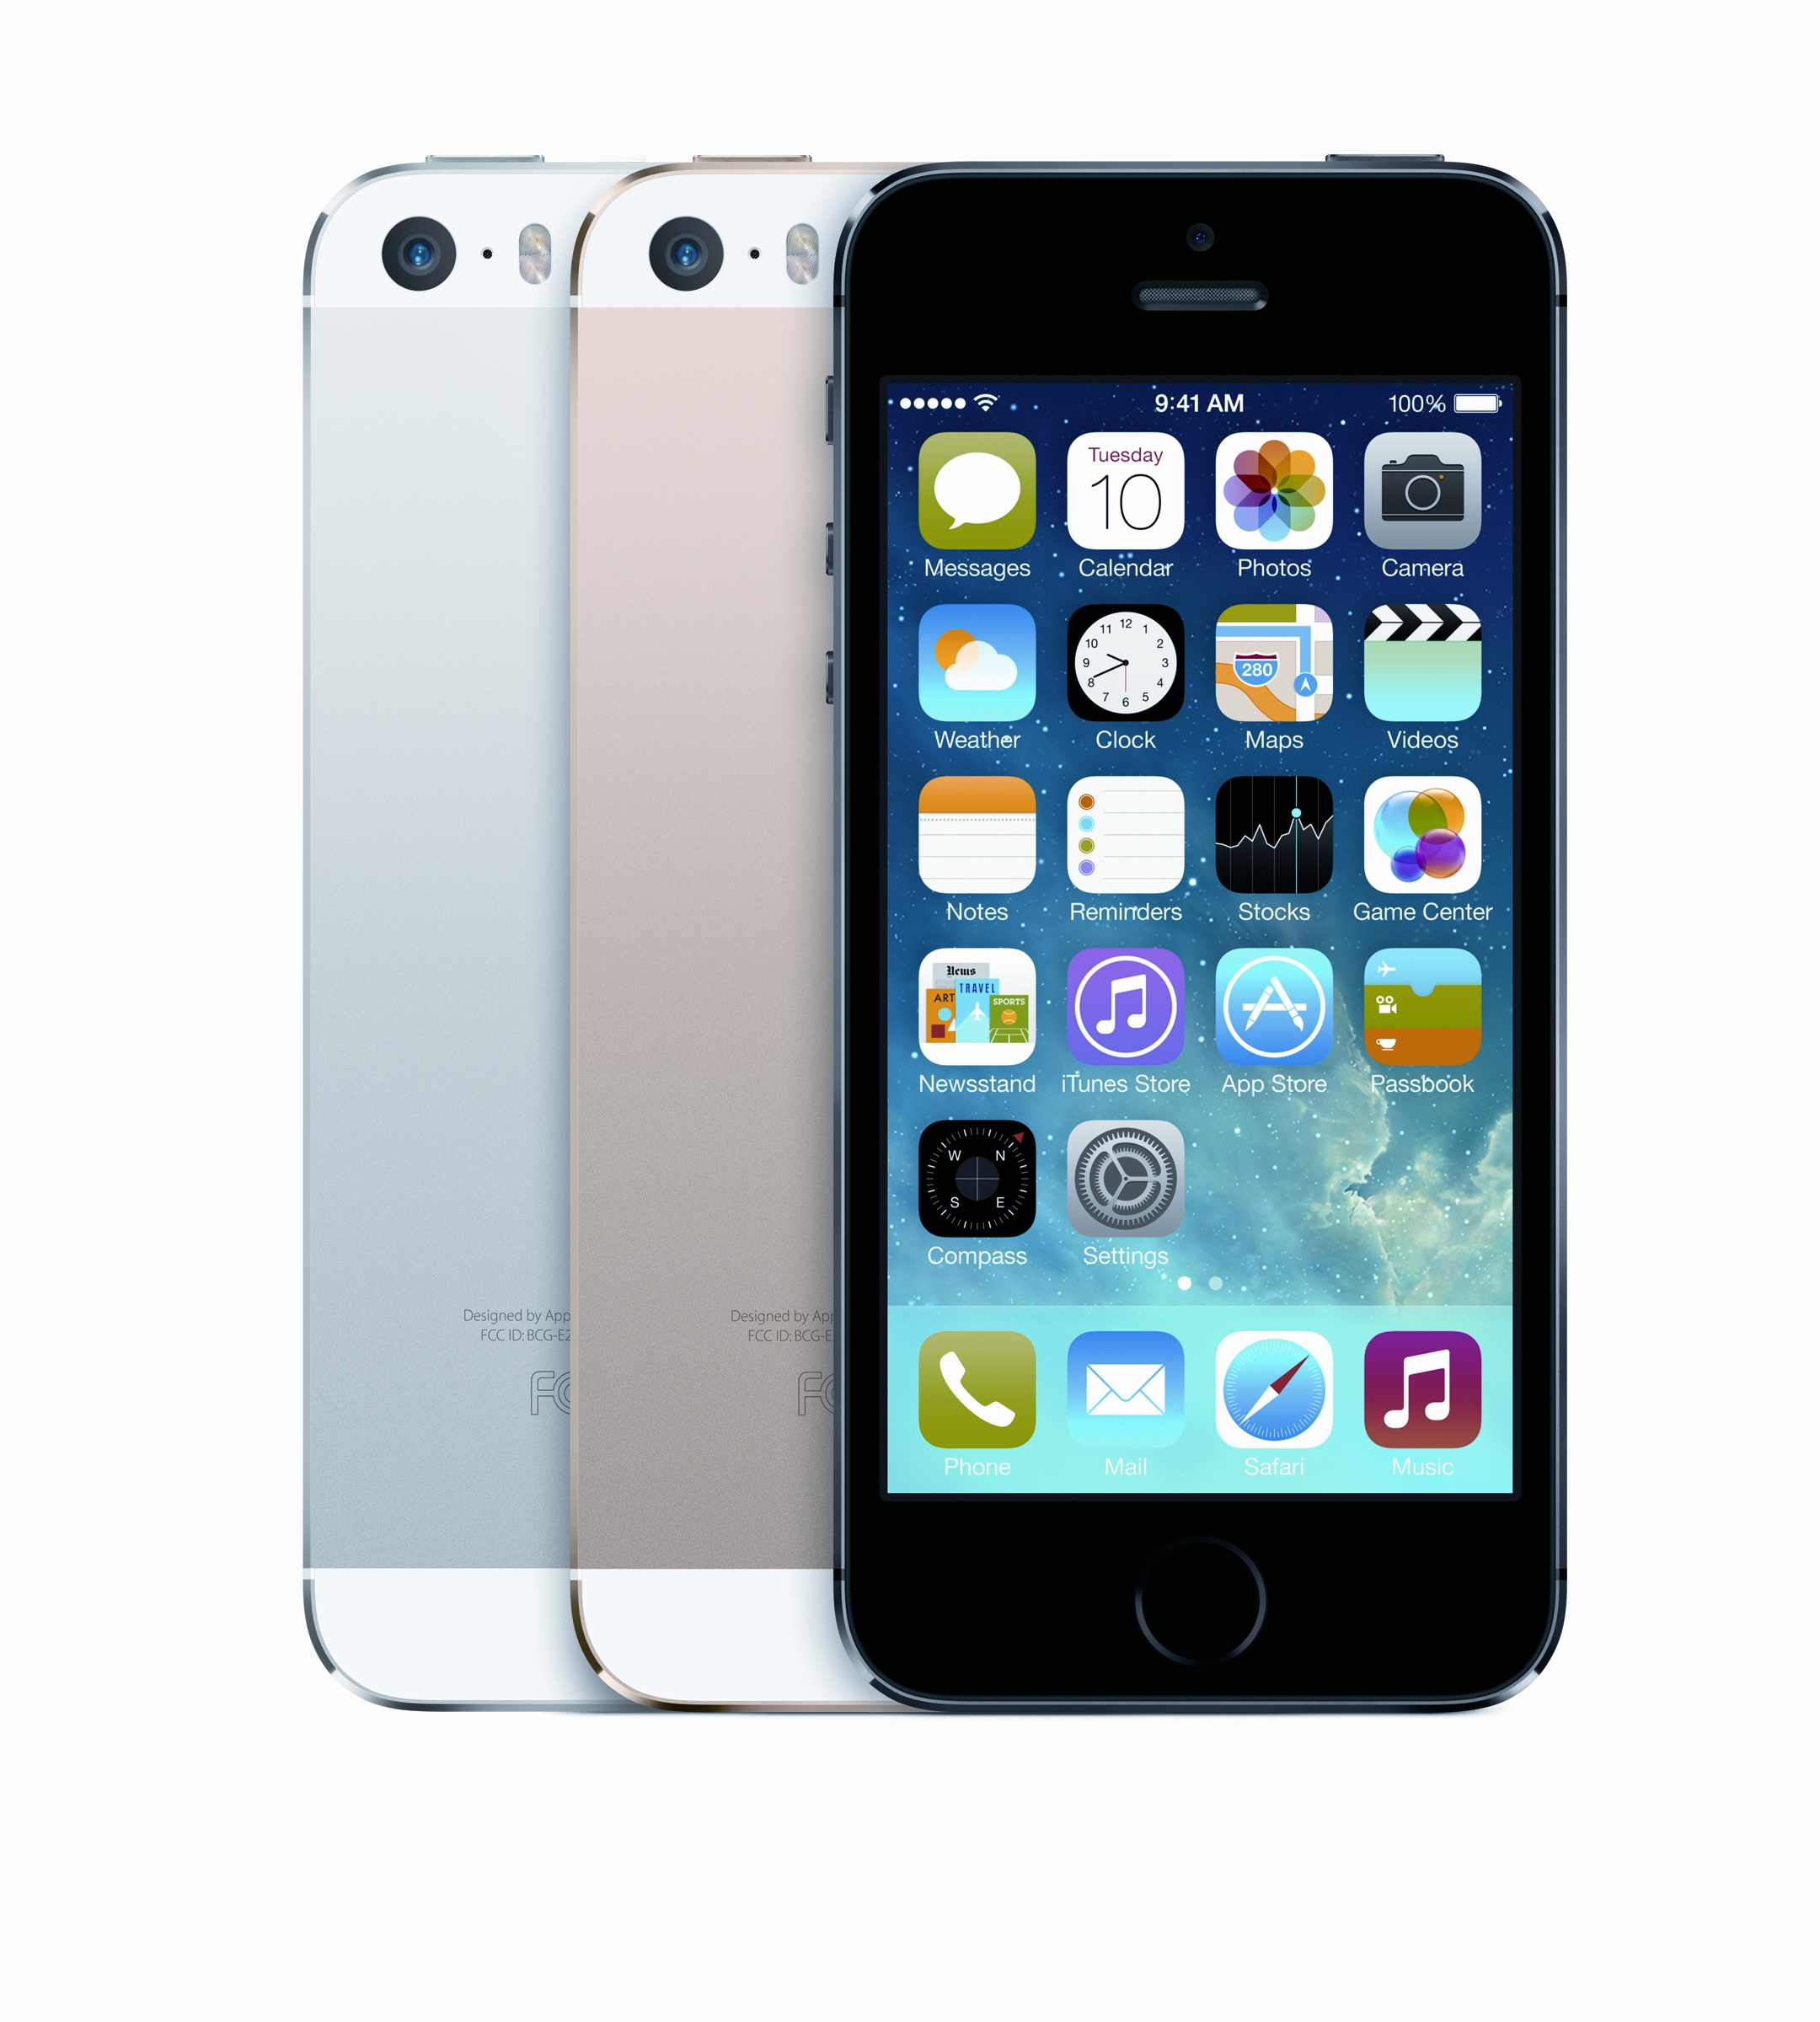 Ap apple iphone 5s space gray 32gb - Apple Iphone 5s 16gb 32gb 64gb At Amp